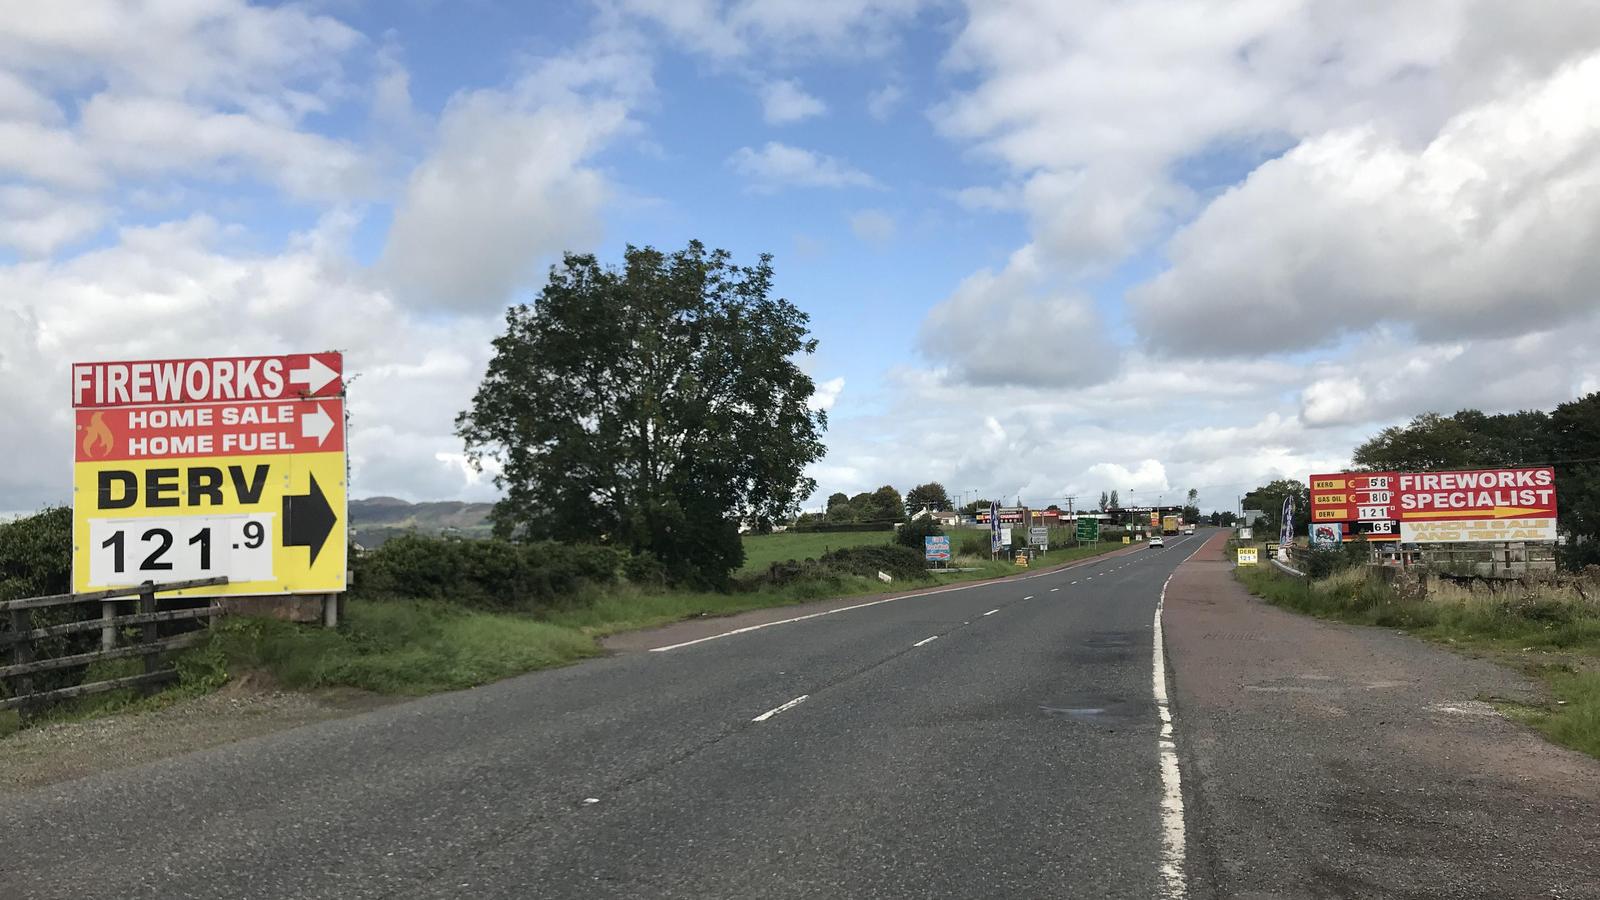 an unmarked border between Ireland and Northern Ireland